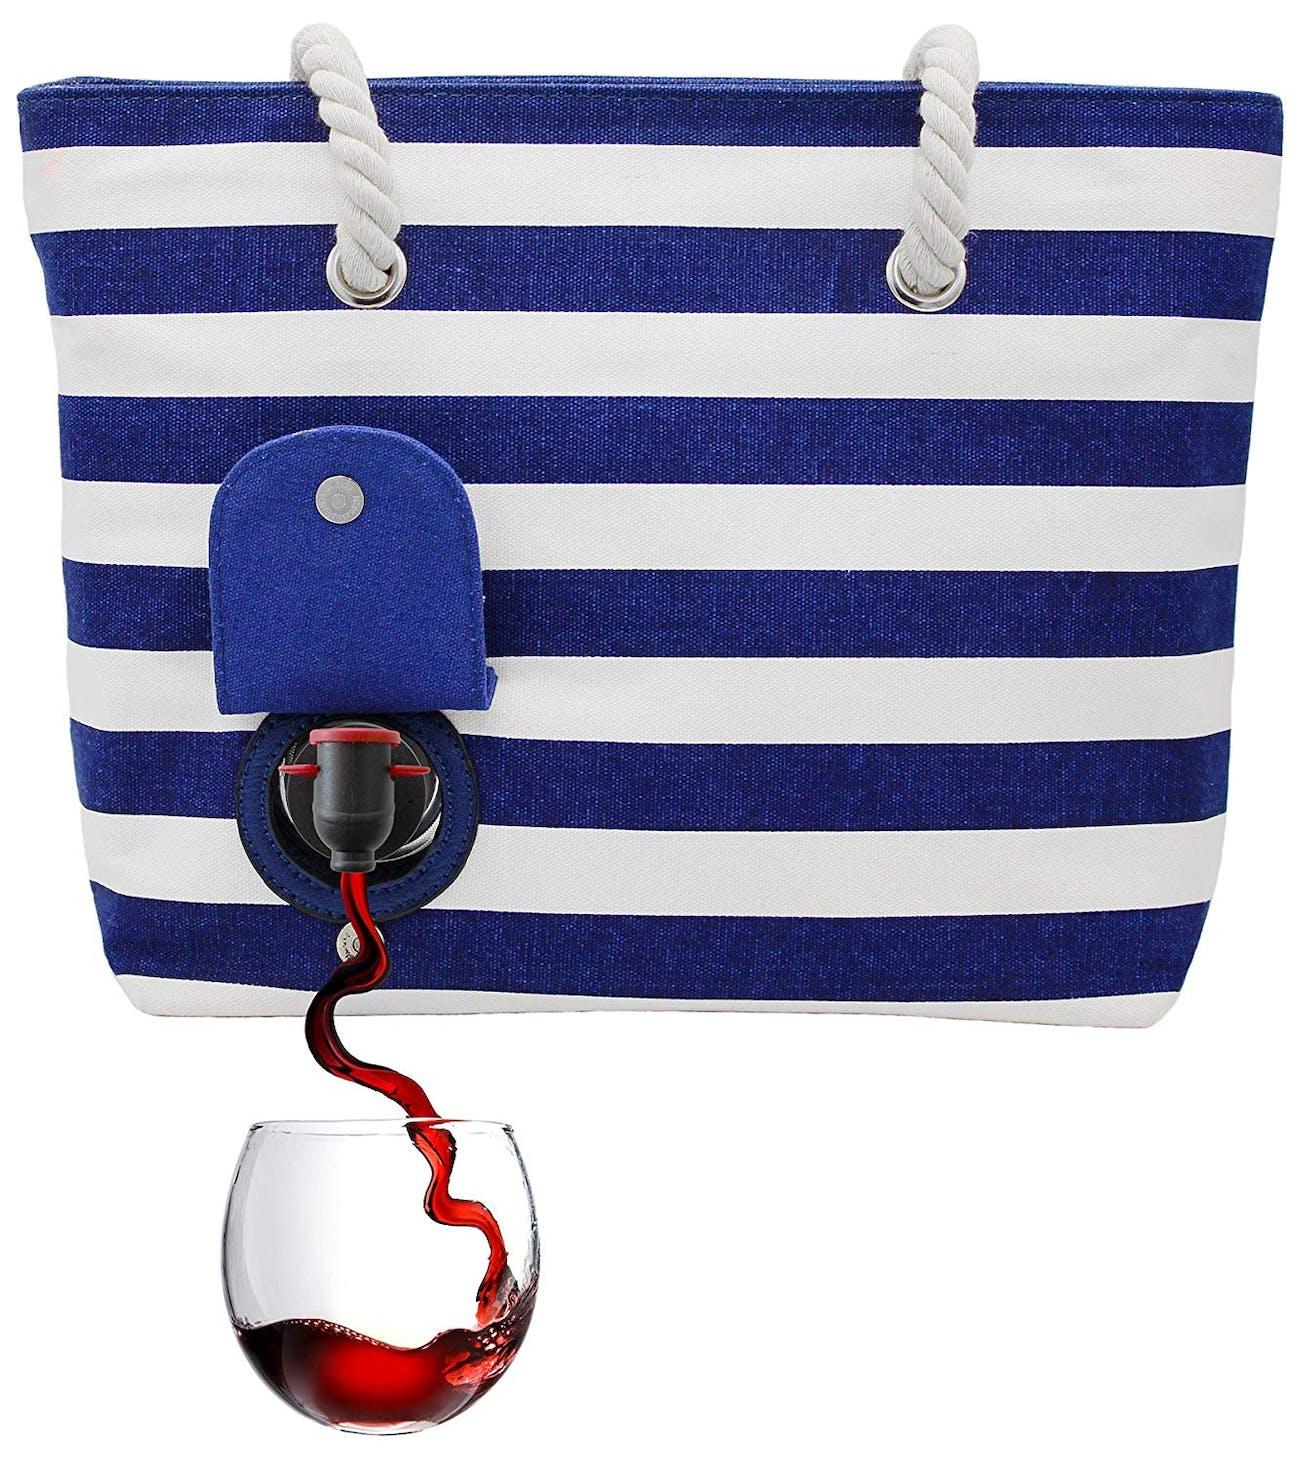 wine, drinks, beach, alcohol, fashion, bag, Valentine's Day